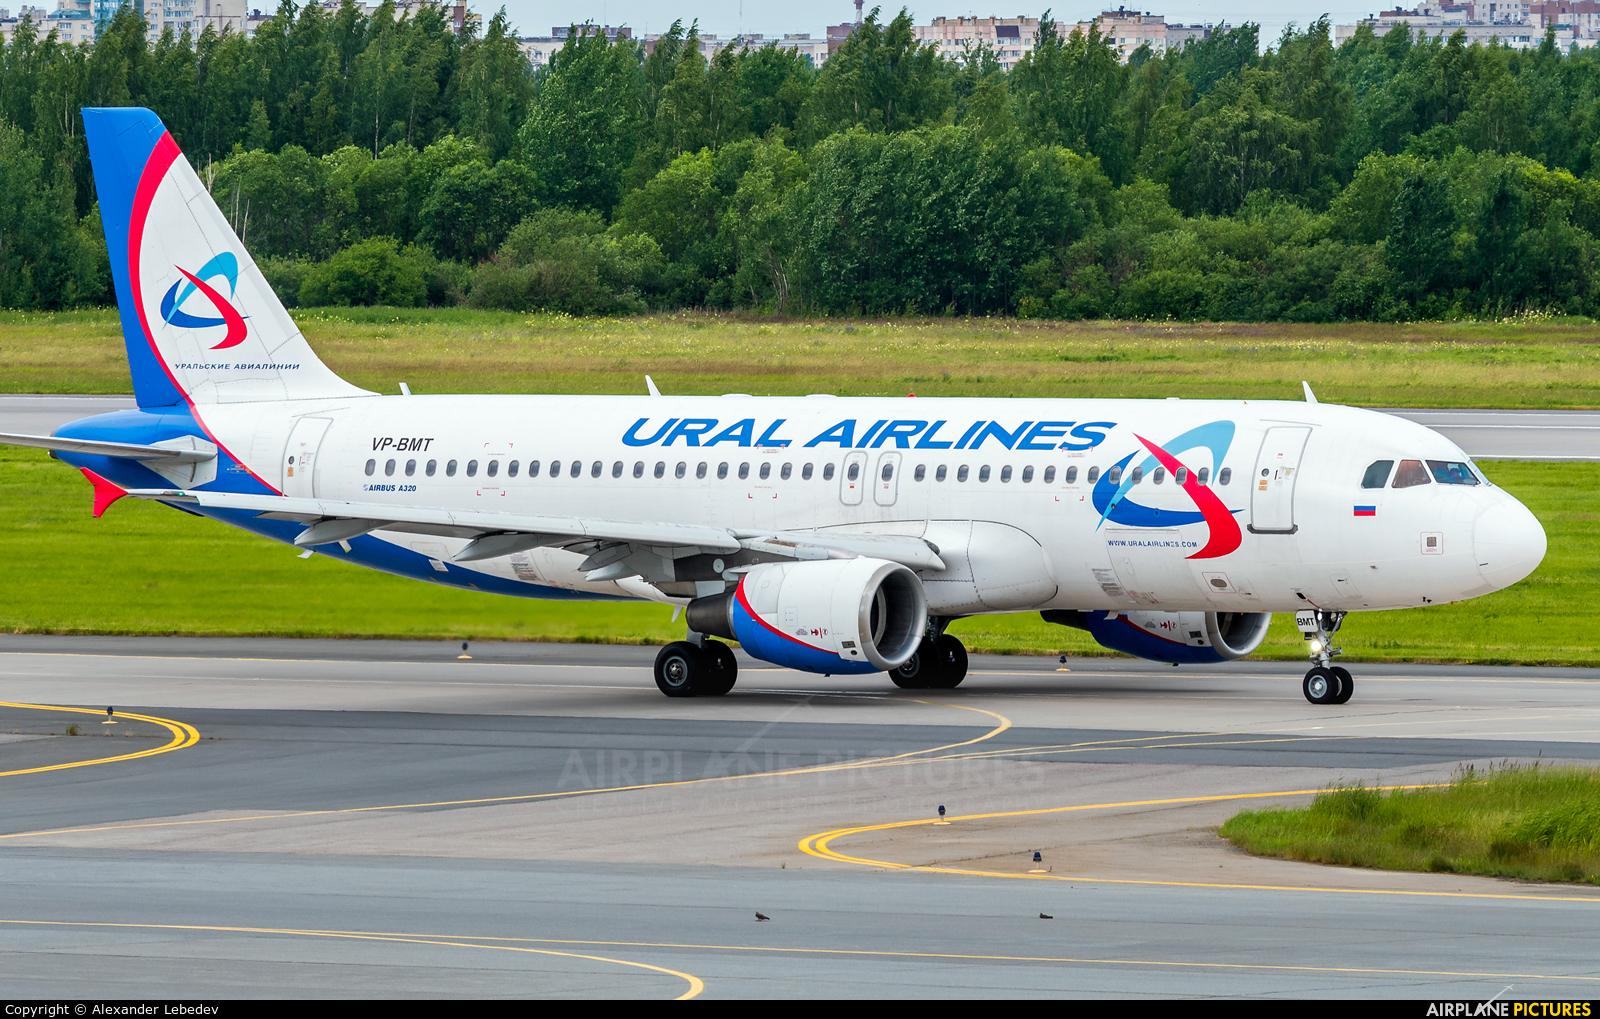 Ural Airlines VP-BMT aircraft at St. Petersburg - Pulkovo